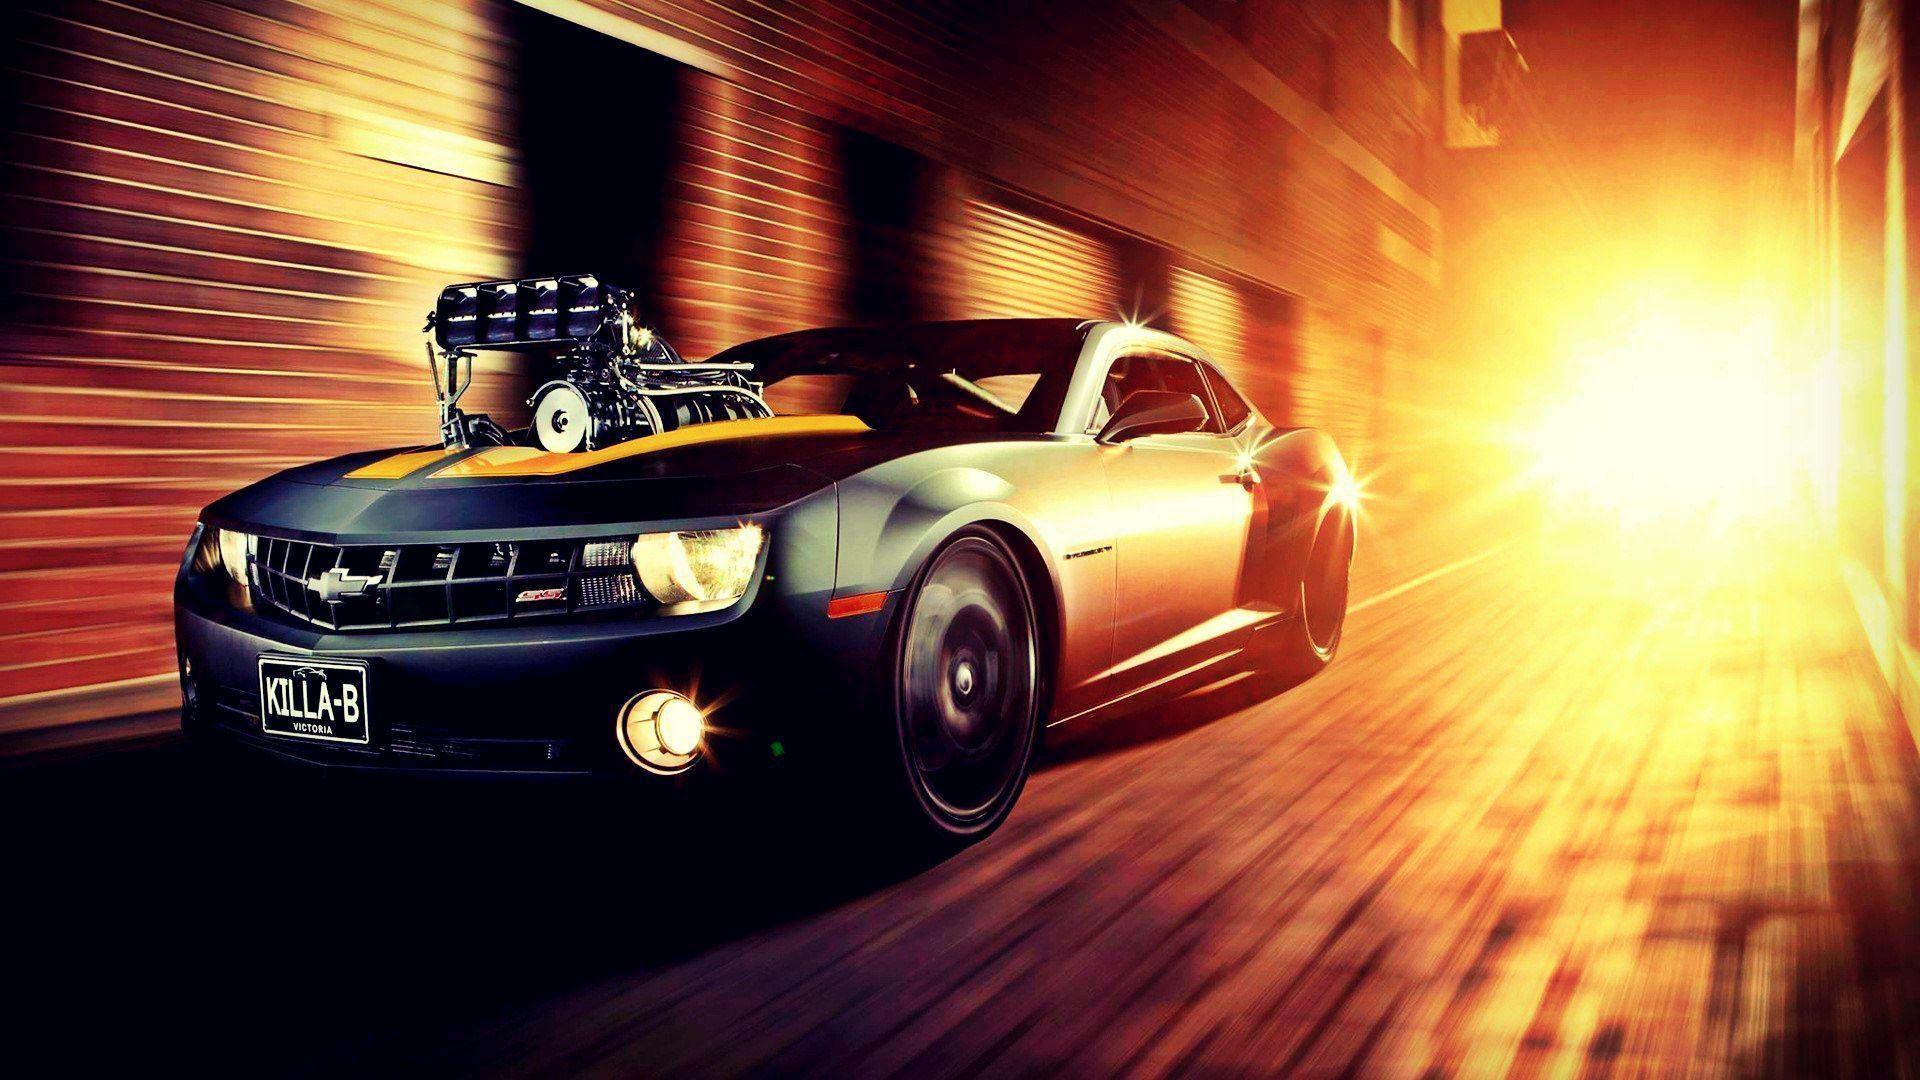 Cool Car Wallpapers Download Free | PixelsTalk Net